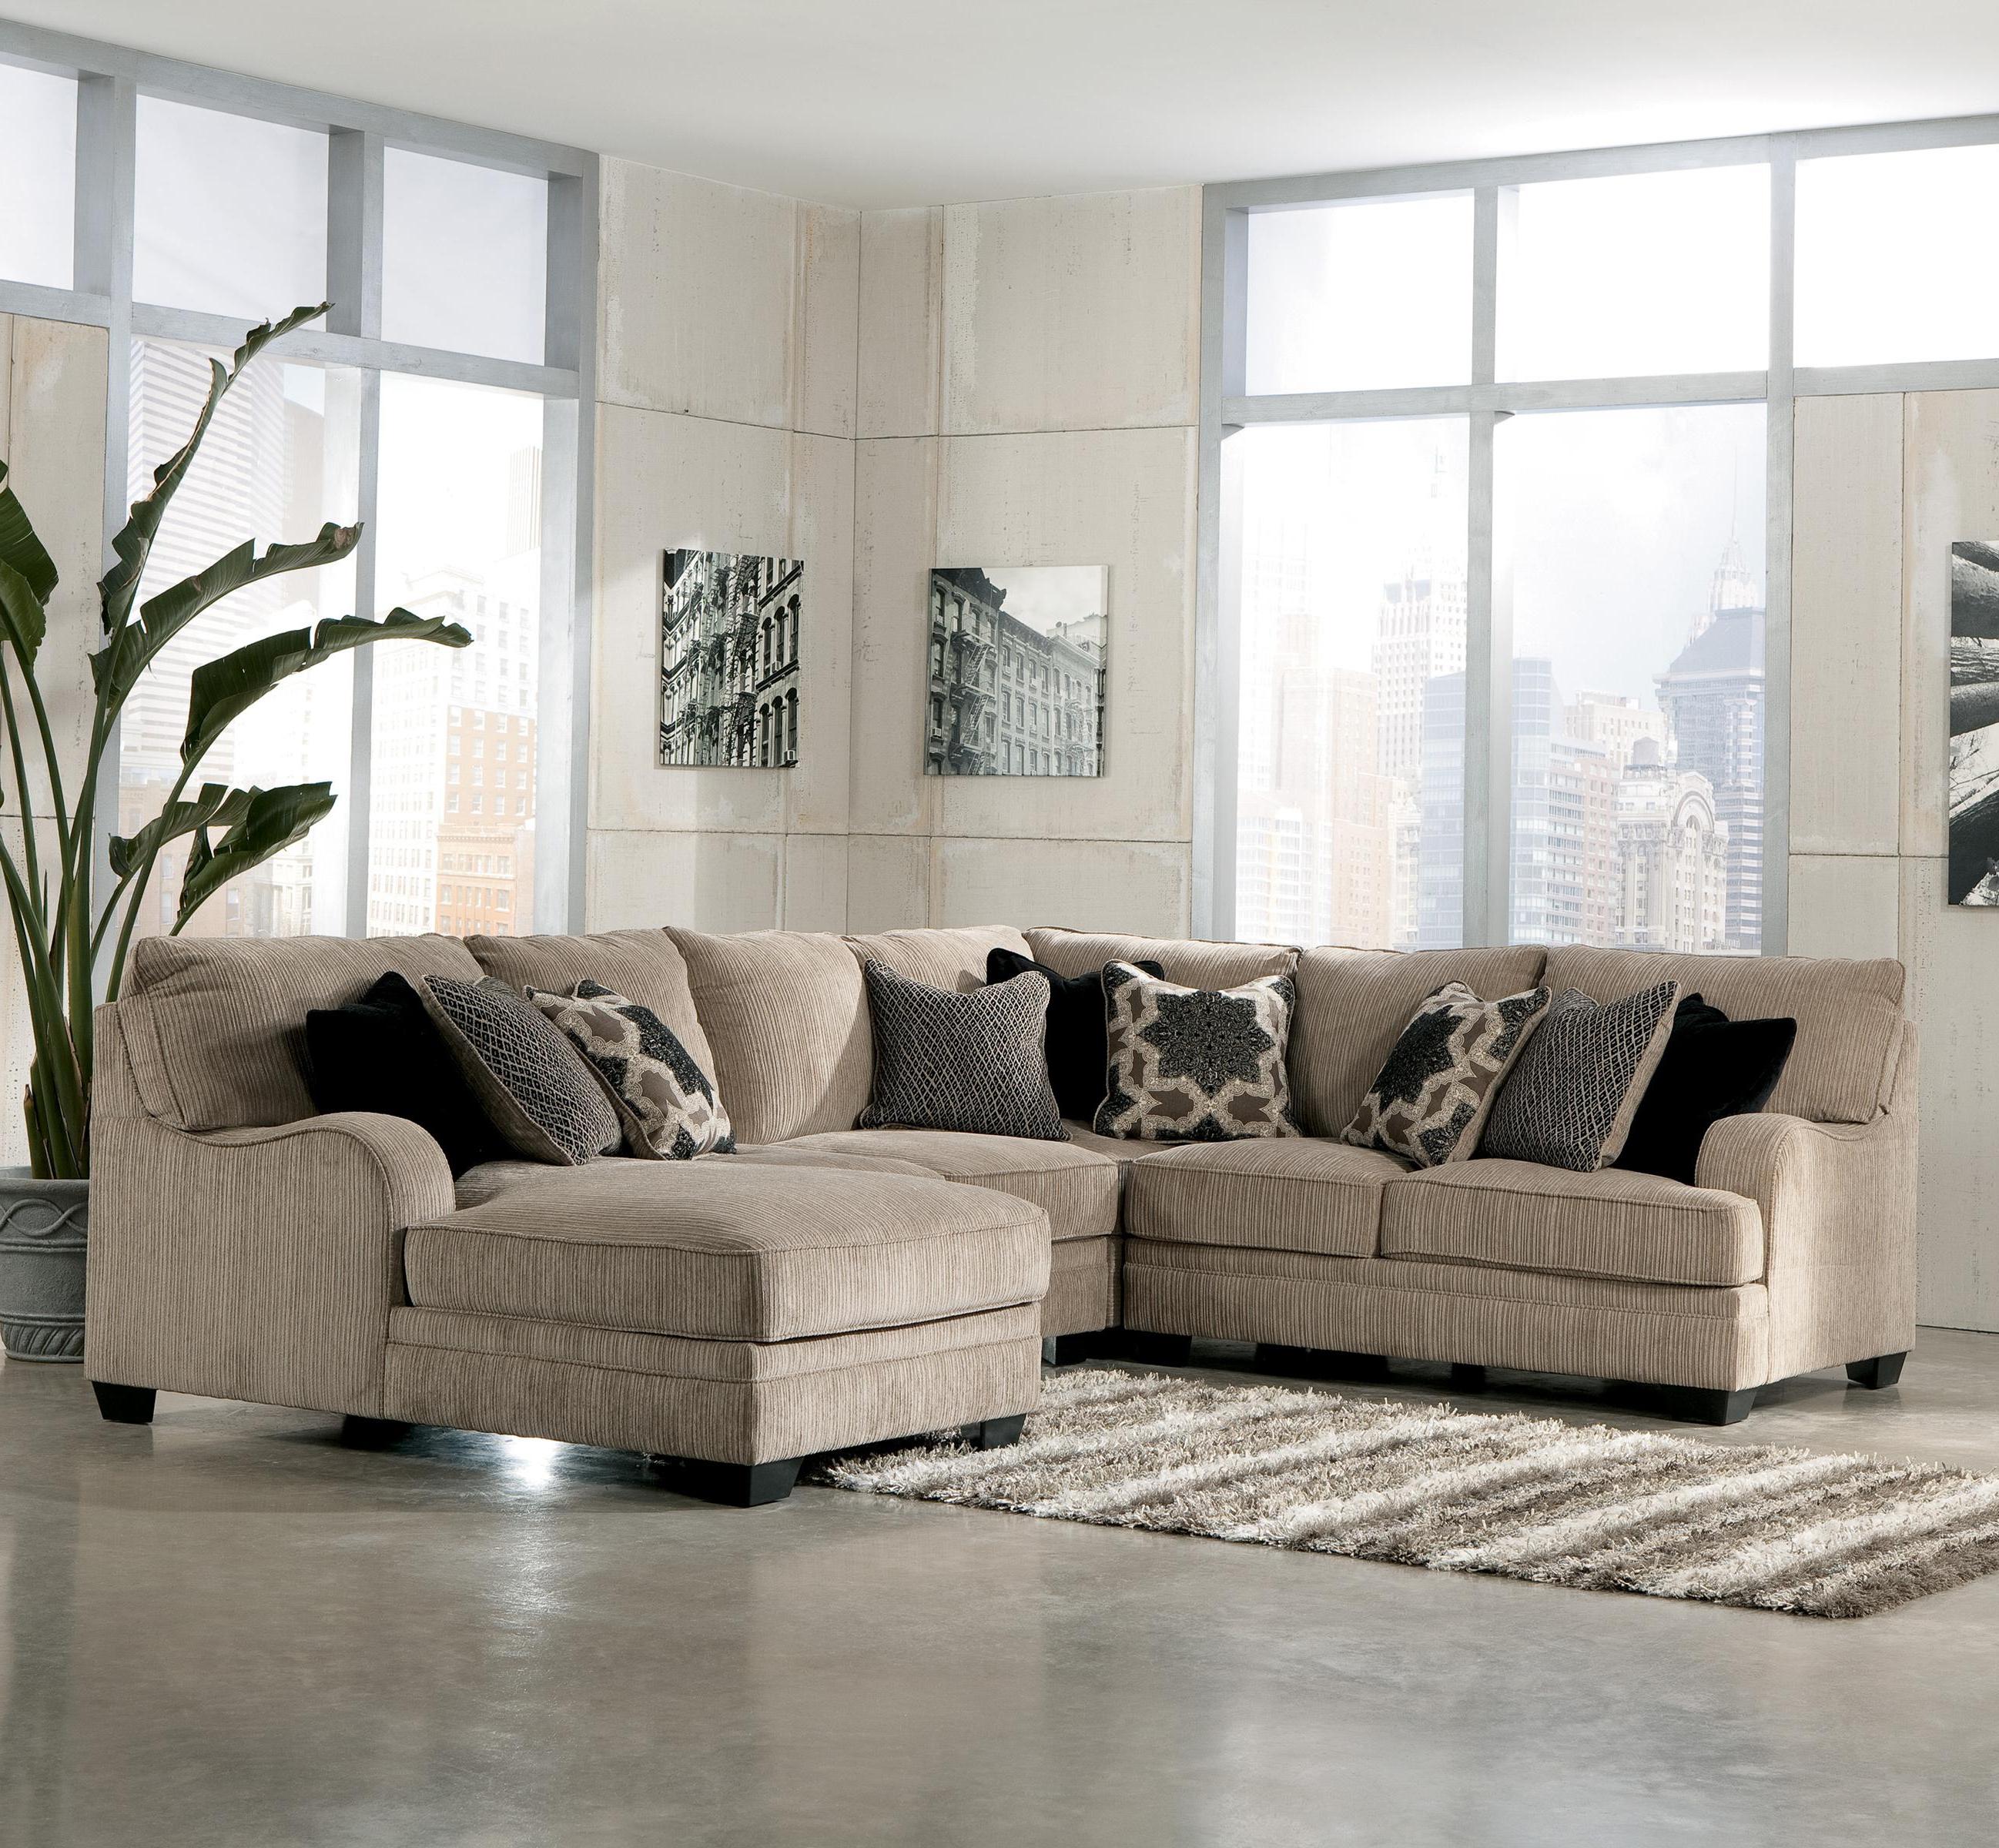 Blaine 4 Piece Sectionals Throughout Most Popular Signature Designashley Katisha – Platinum 4 Piece Sectional Sofa (View 4 of 20)